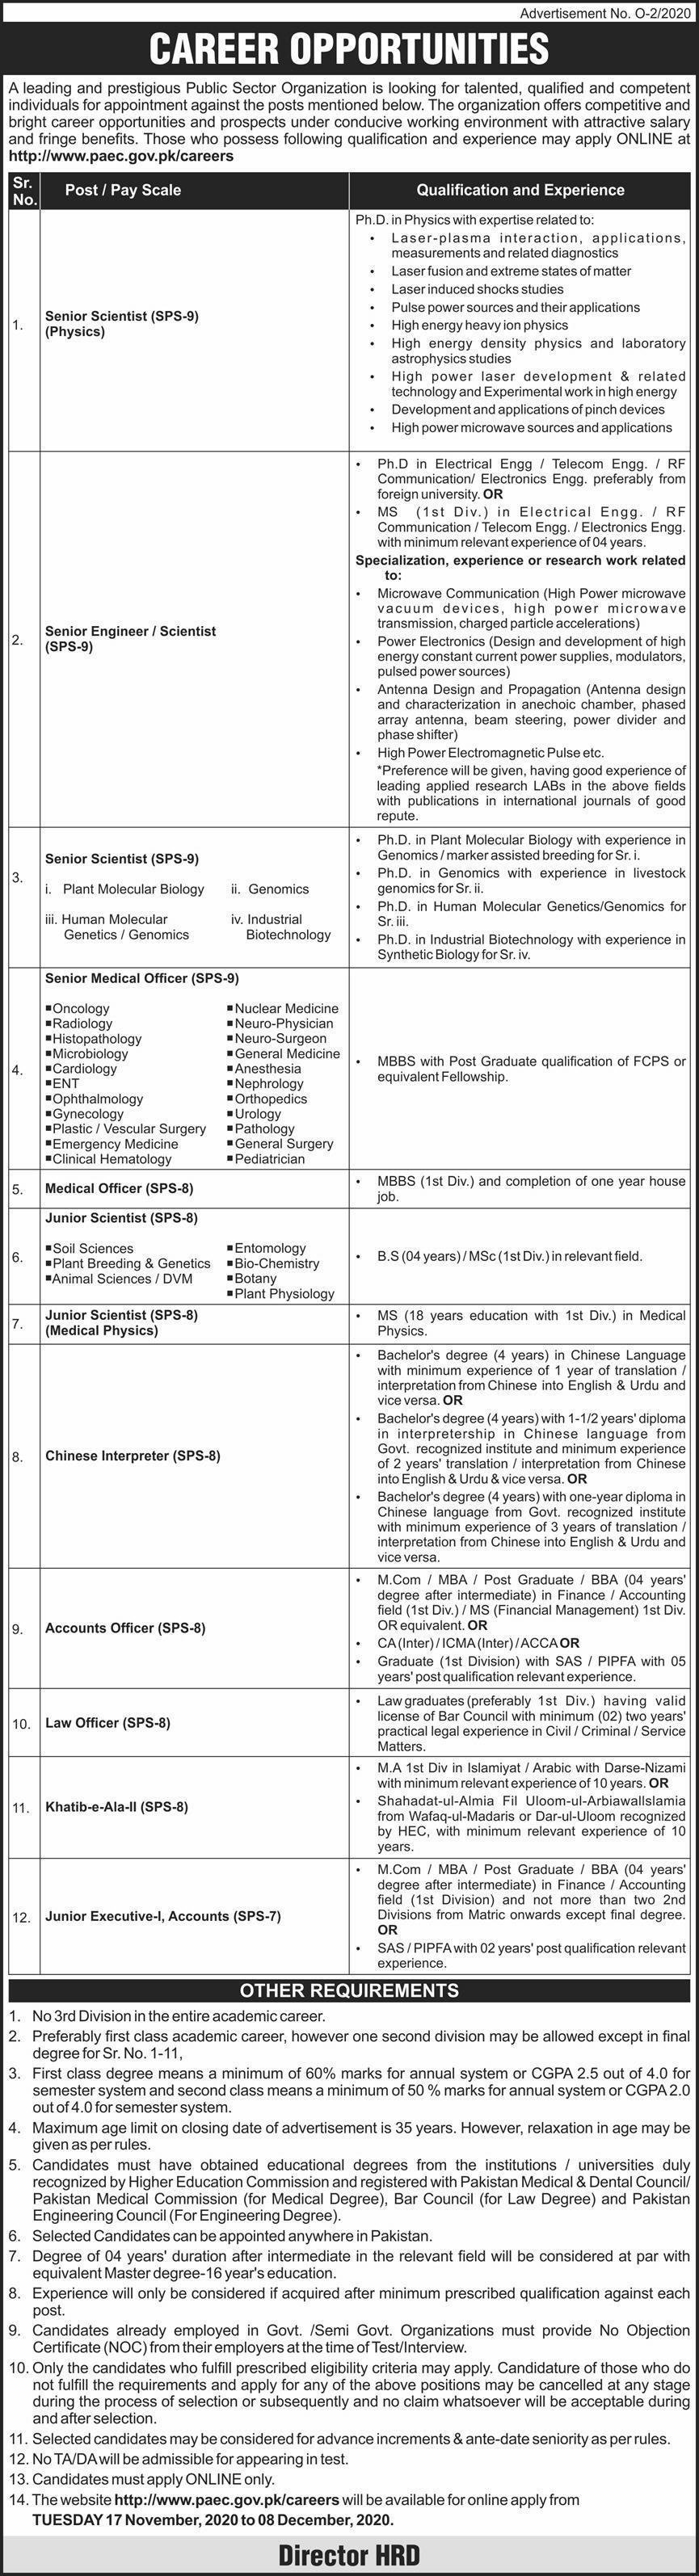 Pakistan Atomic Energy Commission PAEC Jobs in Pakistan - Download Job Application Form - www.paec.gov.pk/careers Jobs 2021